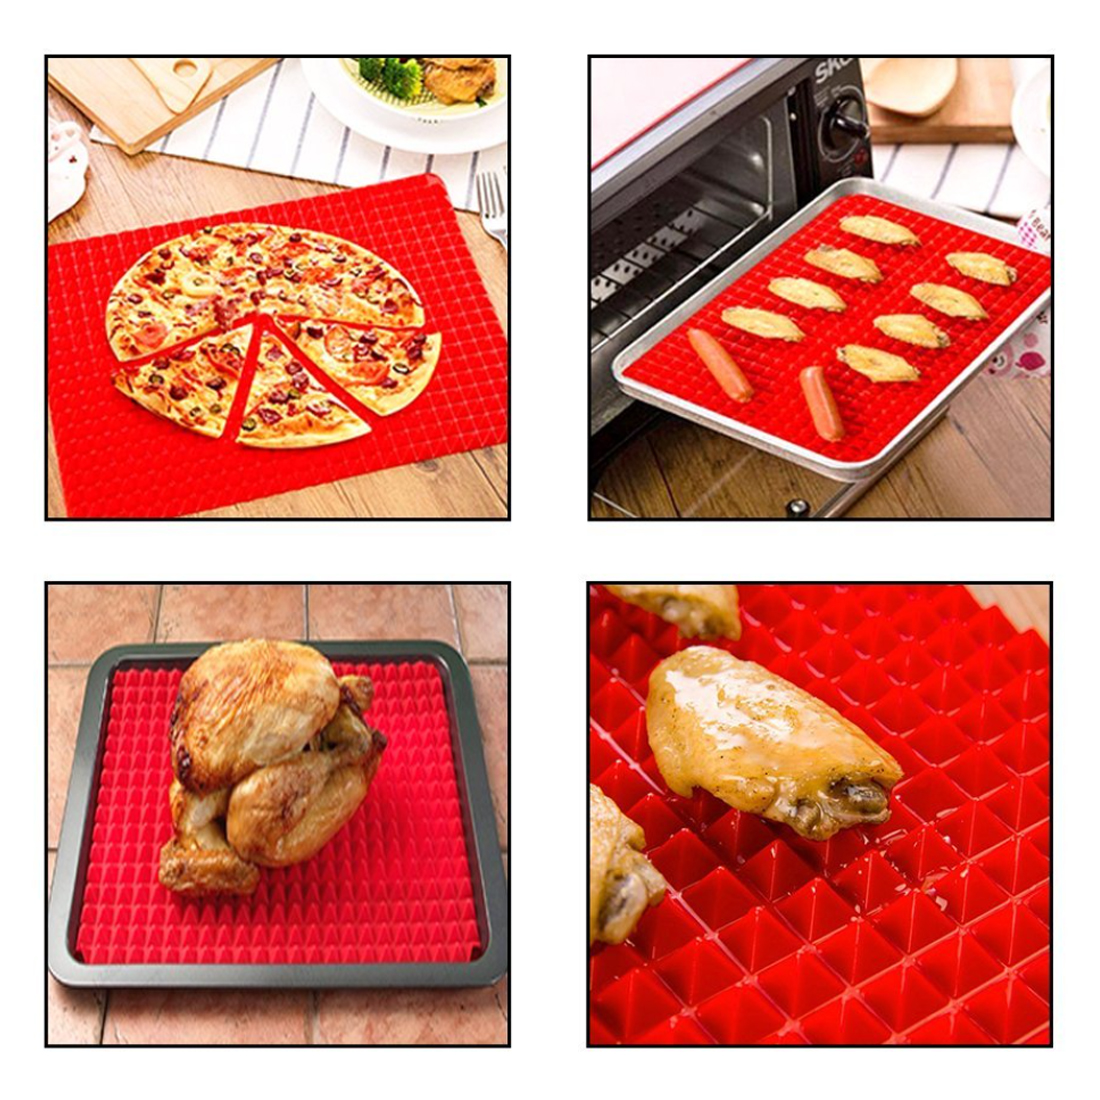 Kitchen Practical Pyramid Silicone Nonstick Baking Mat